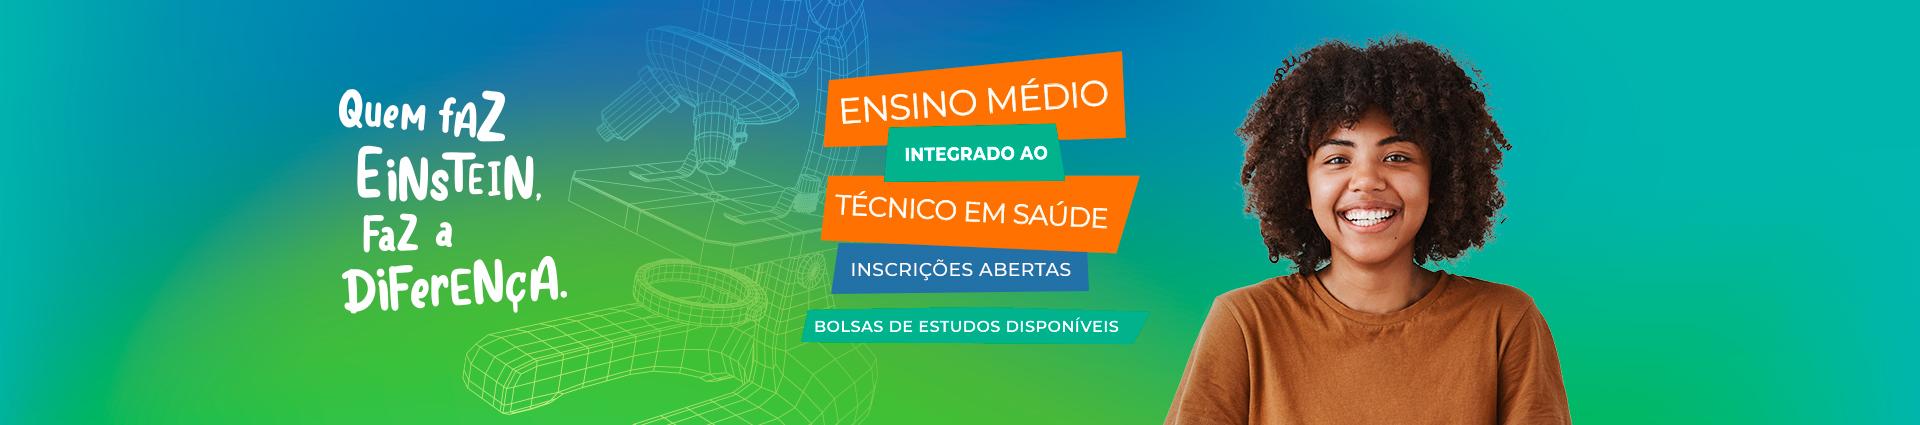 Banner_Ensino-Medio-Tecnico